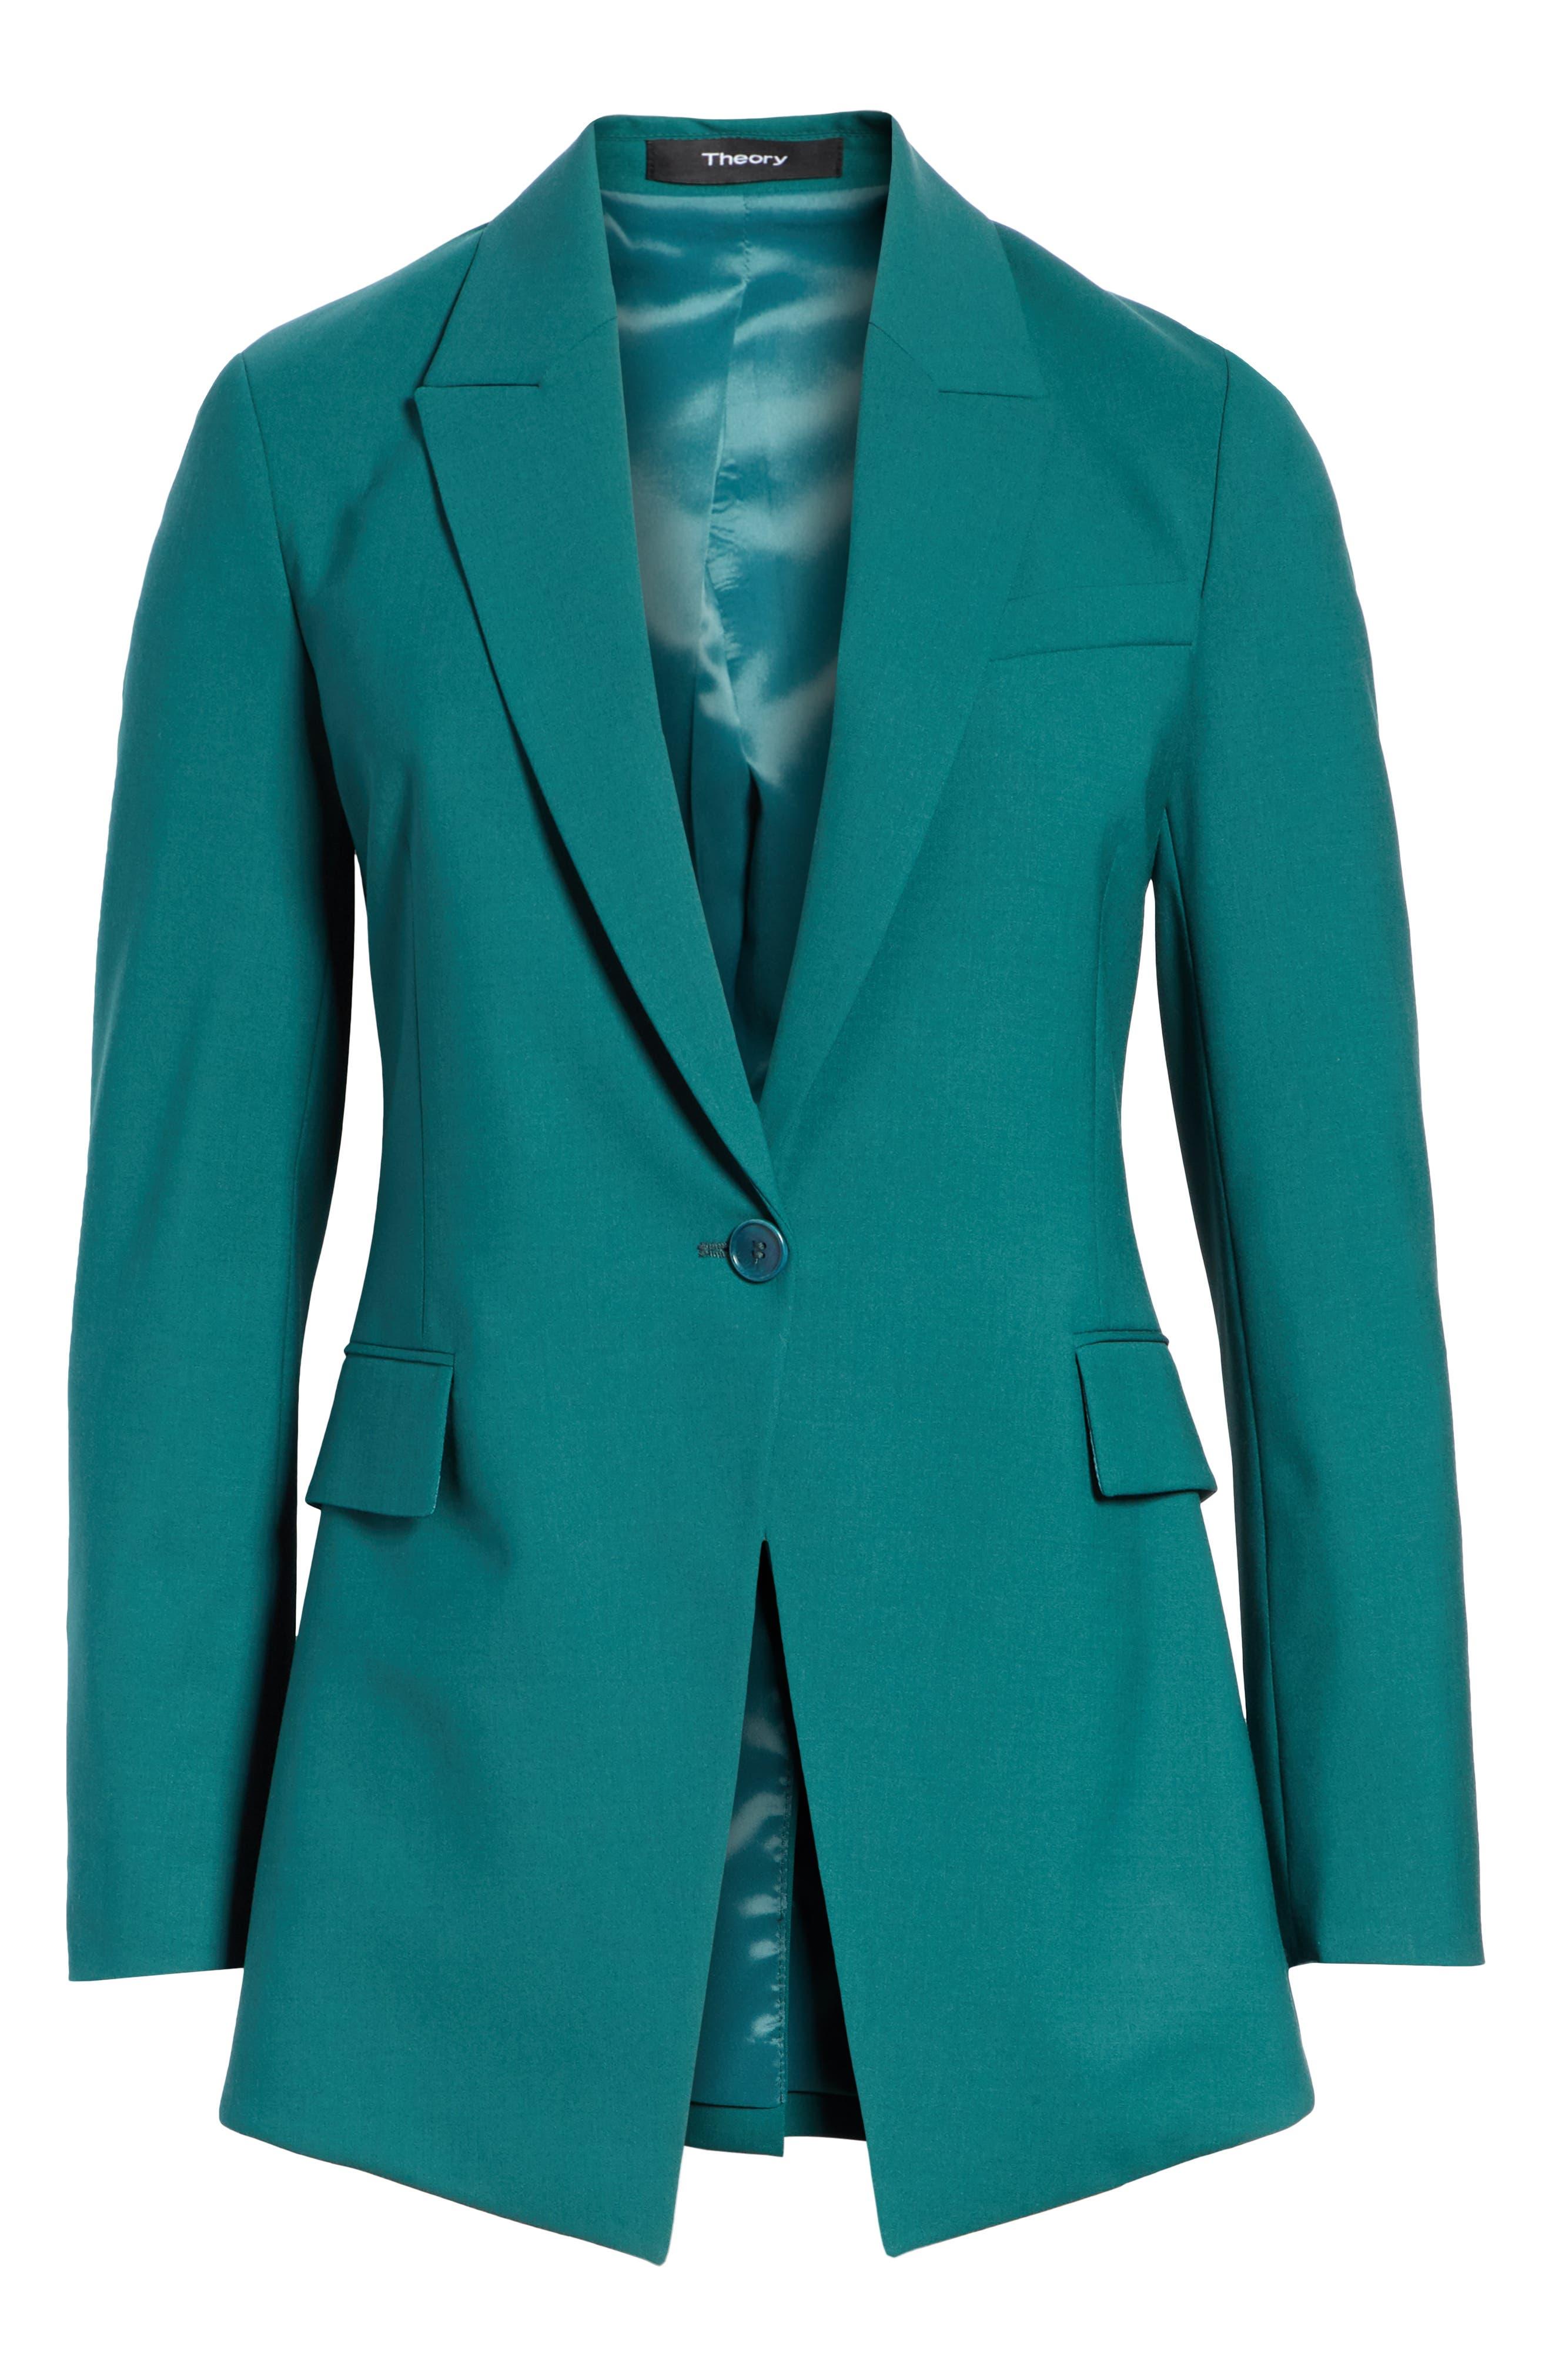 Etienette B Good Wool Suit Jacket,                             Alternate thumbnail 34, color,